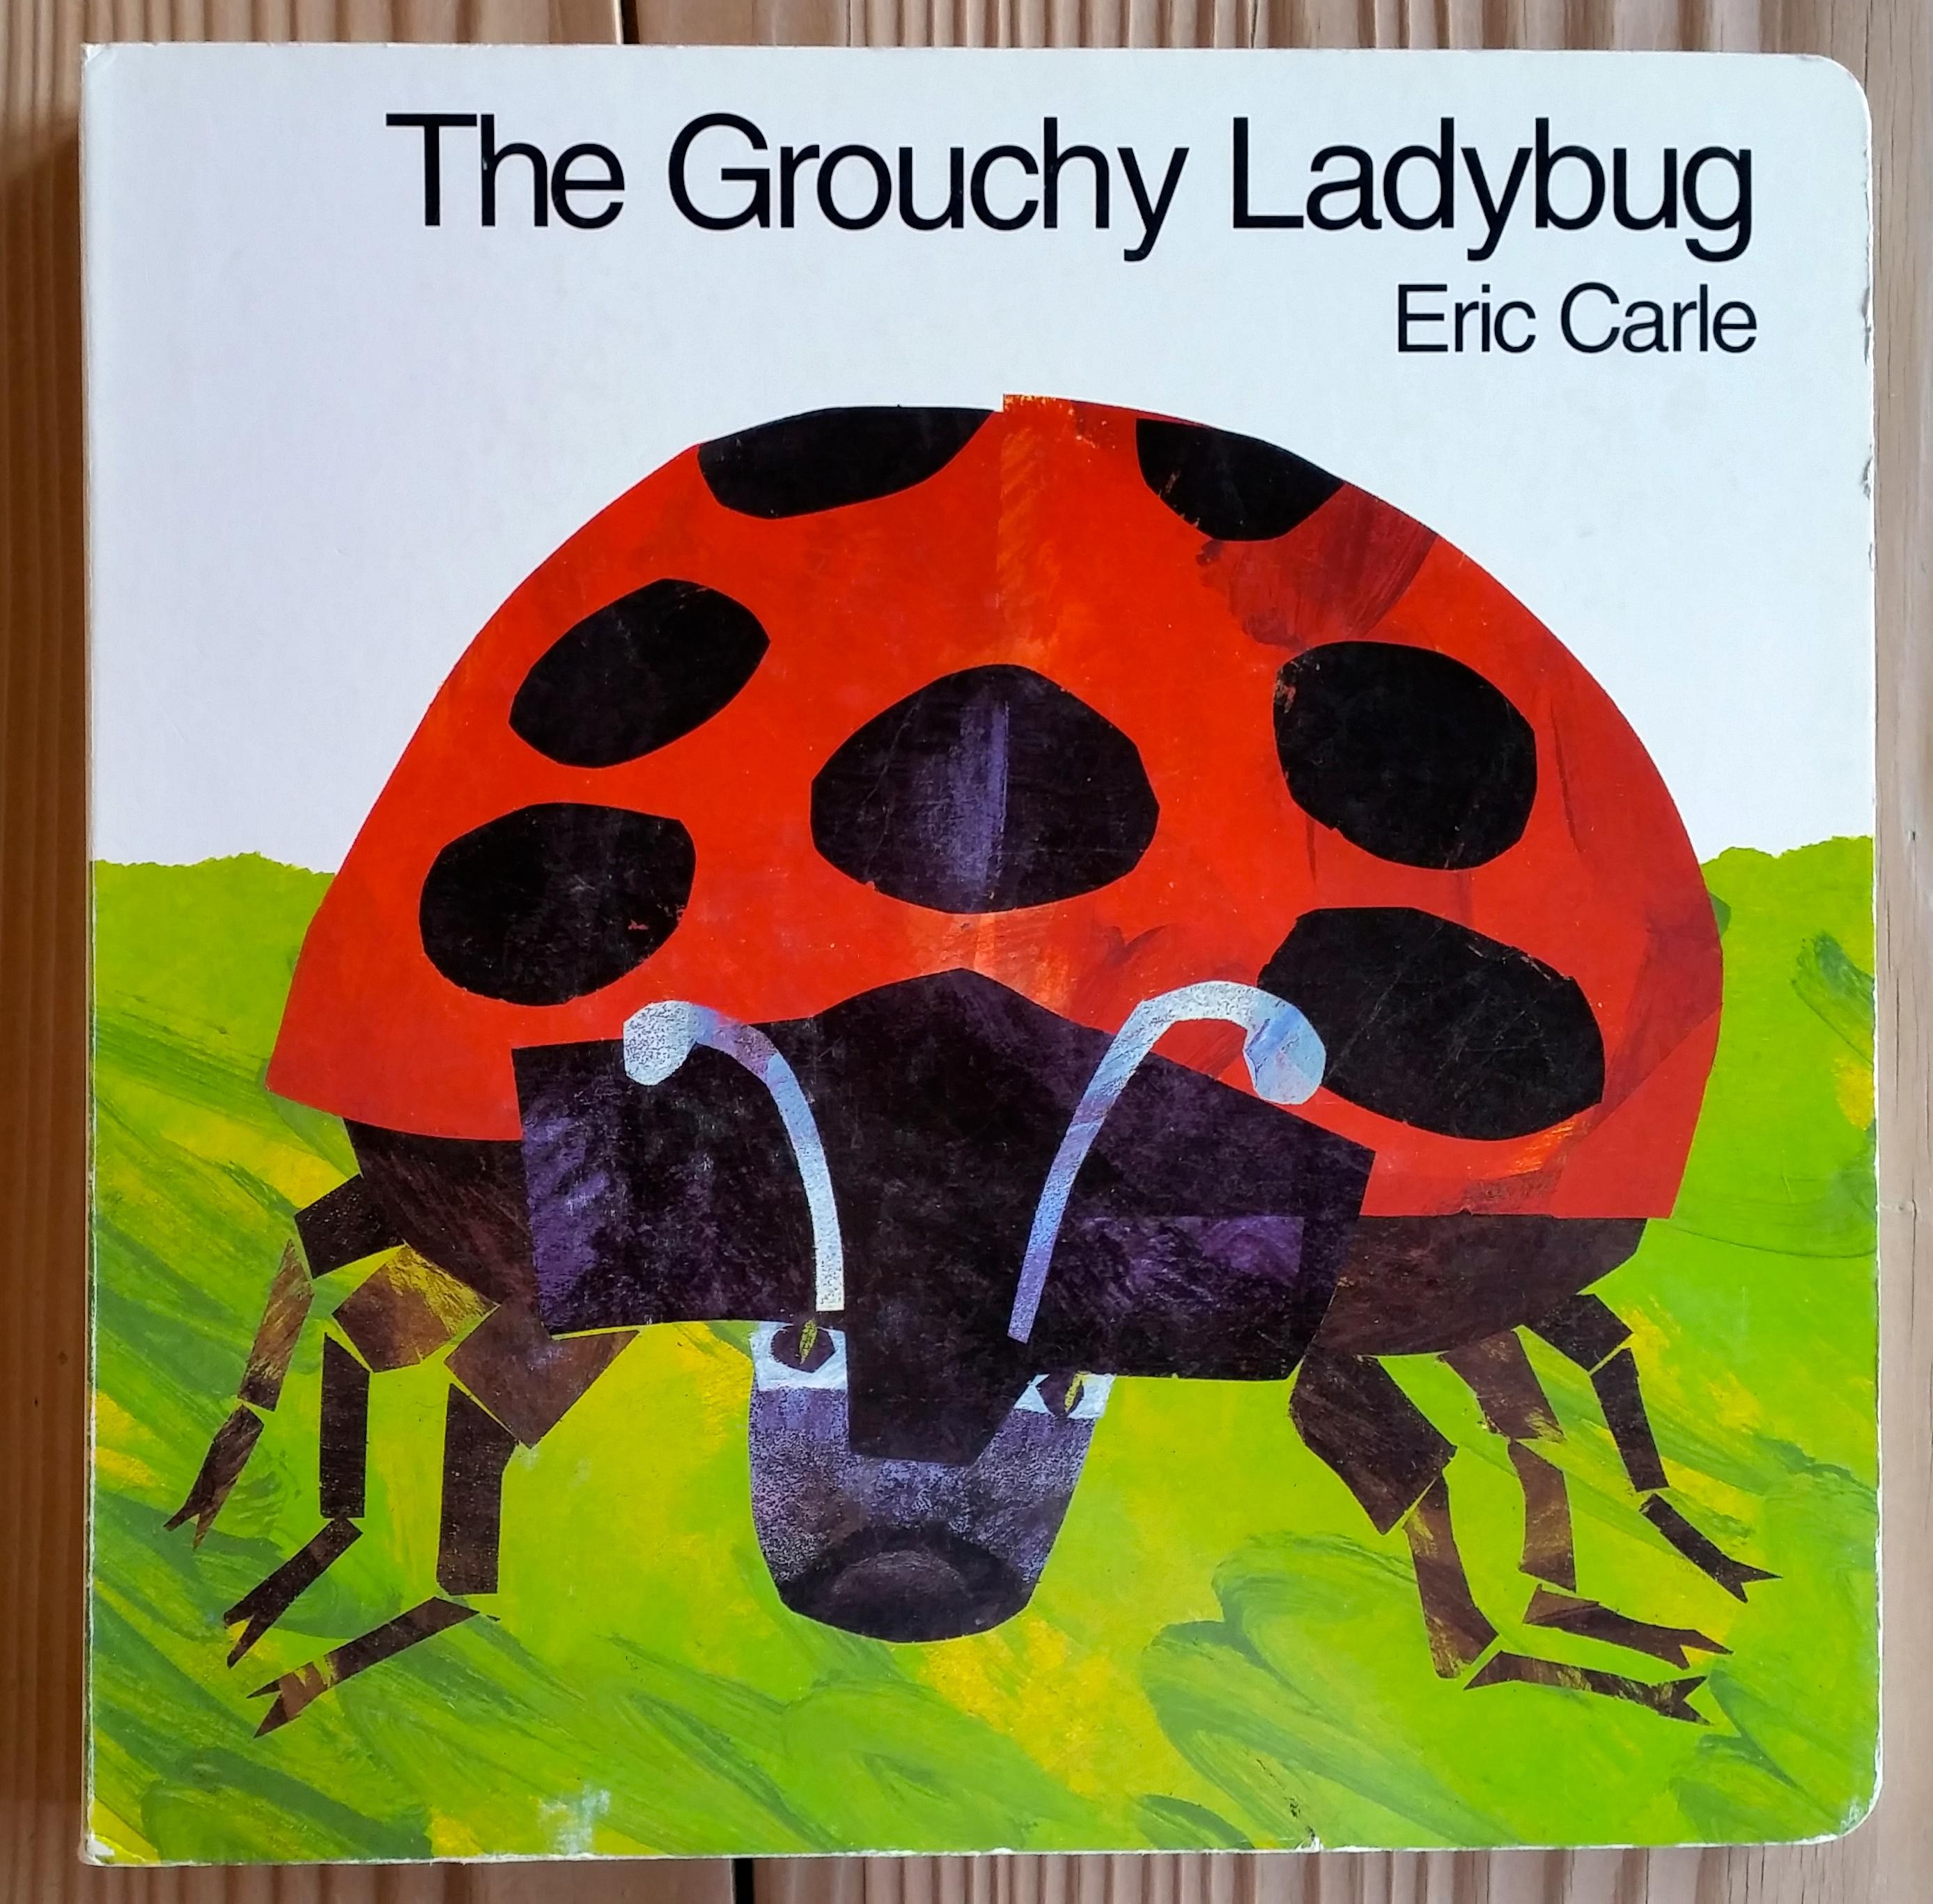 Ladybugs & Worms